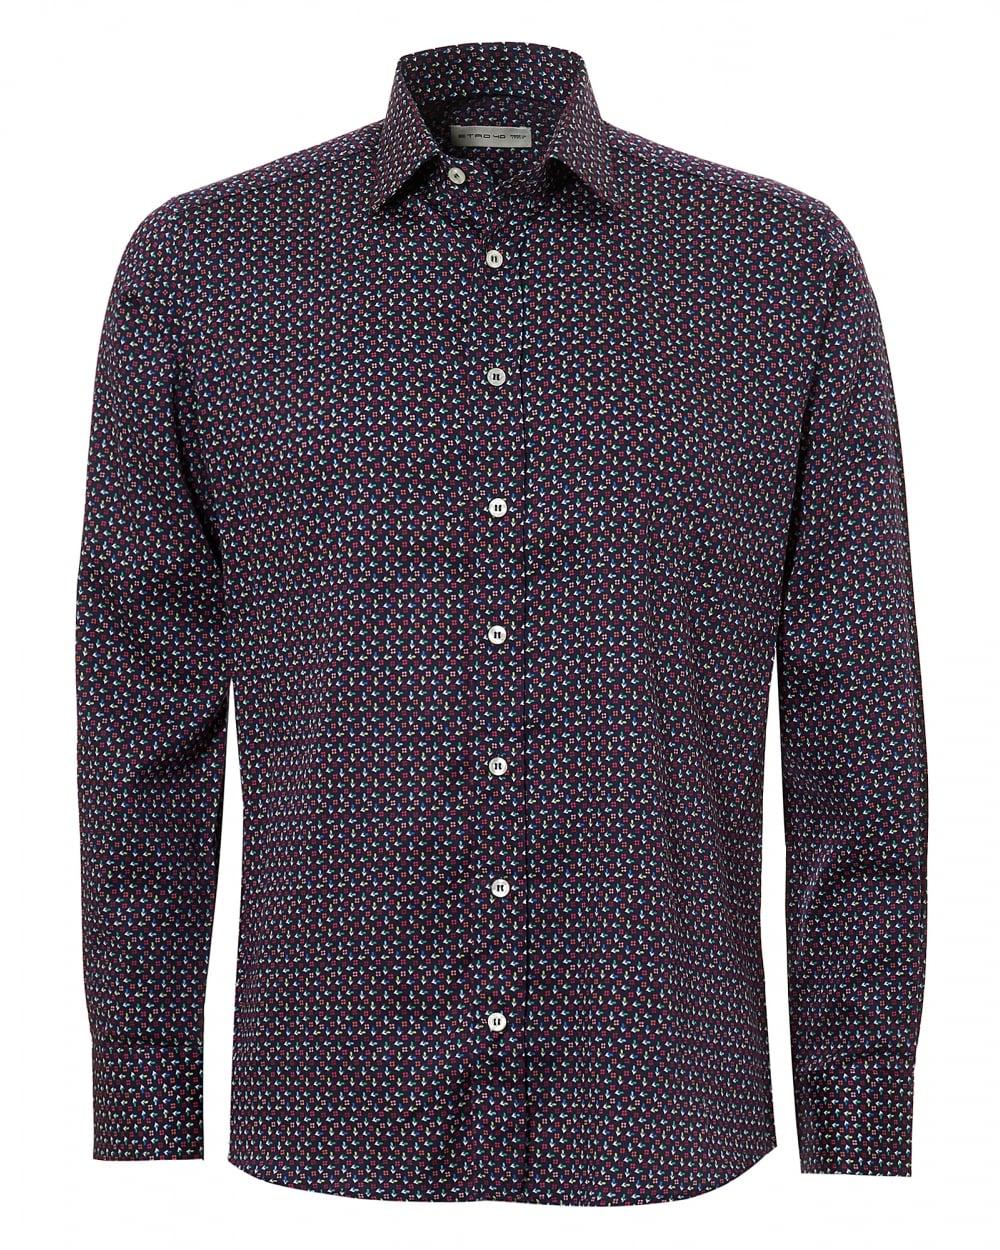 Etro Mens Micro Floral Print Regular Fit Navy Multi Shirt